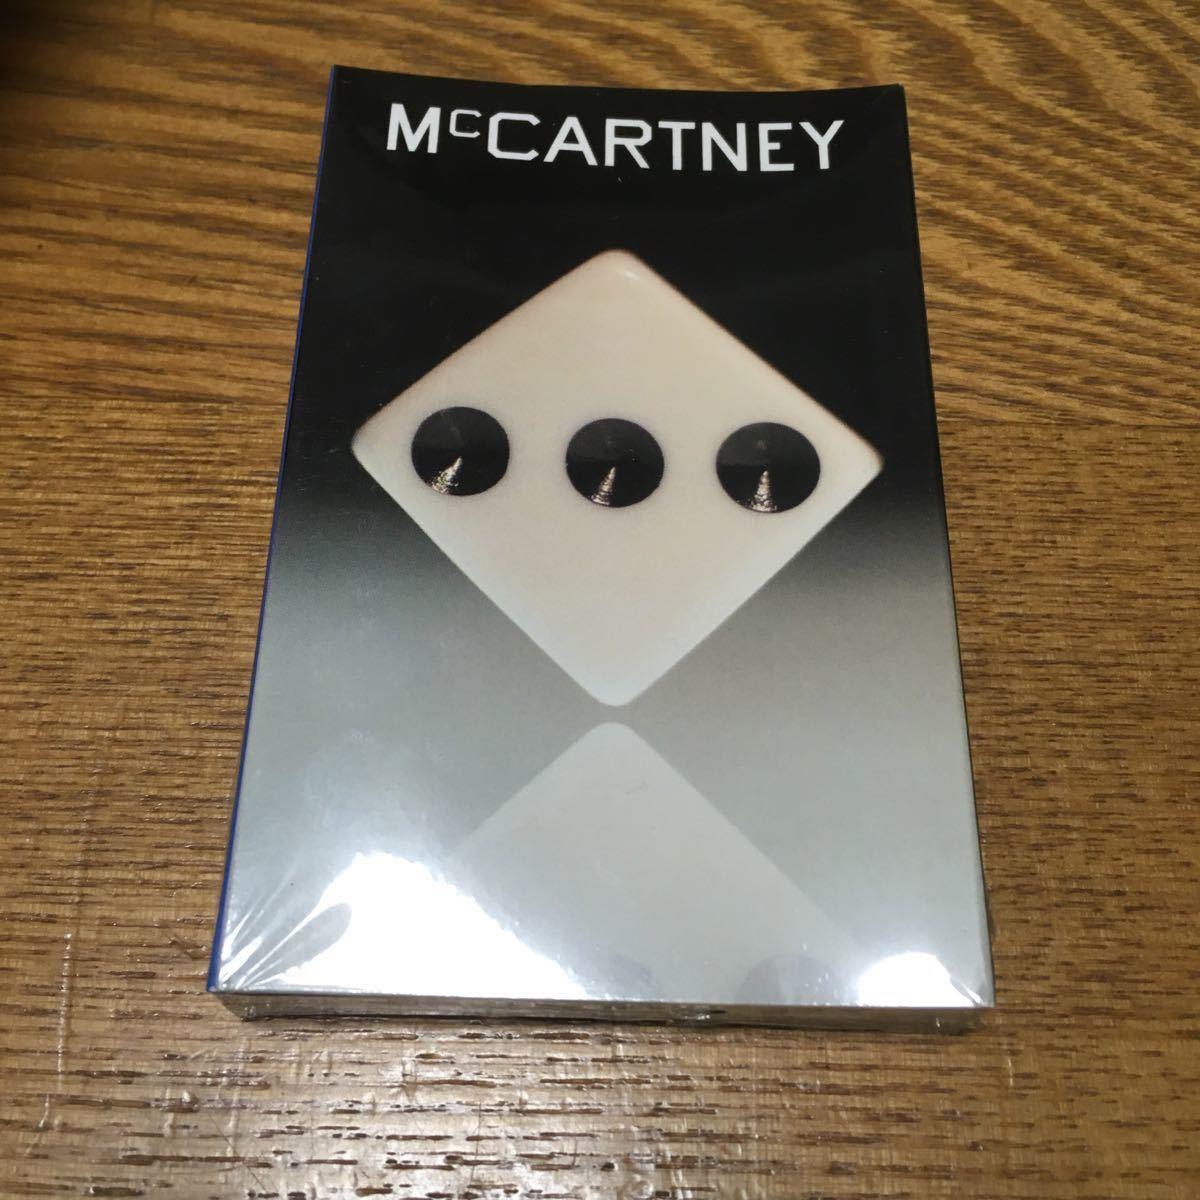 Paul Mccartney /McCARTNEY Ⅲ カセットテープ 新品未開封 ポールマッカートニー EU盤